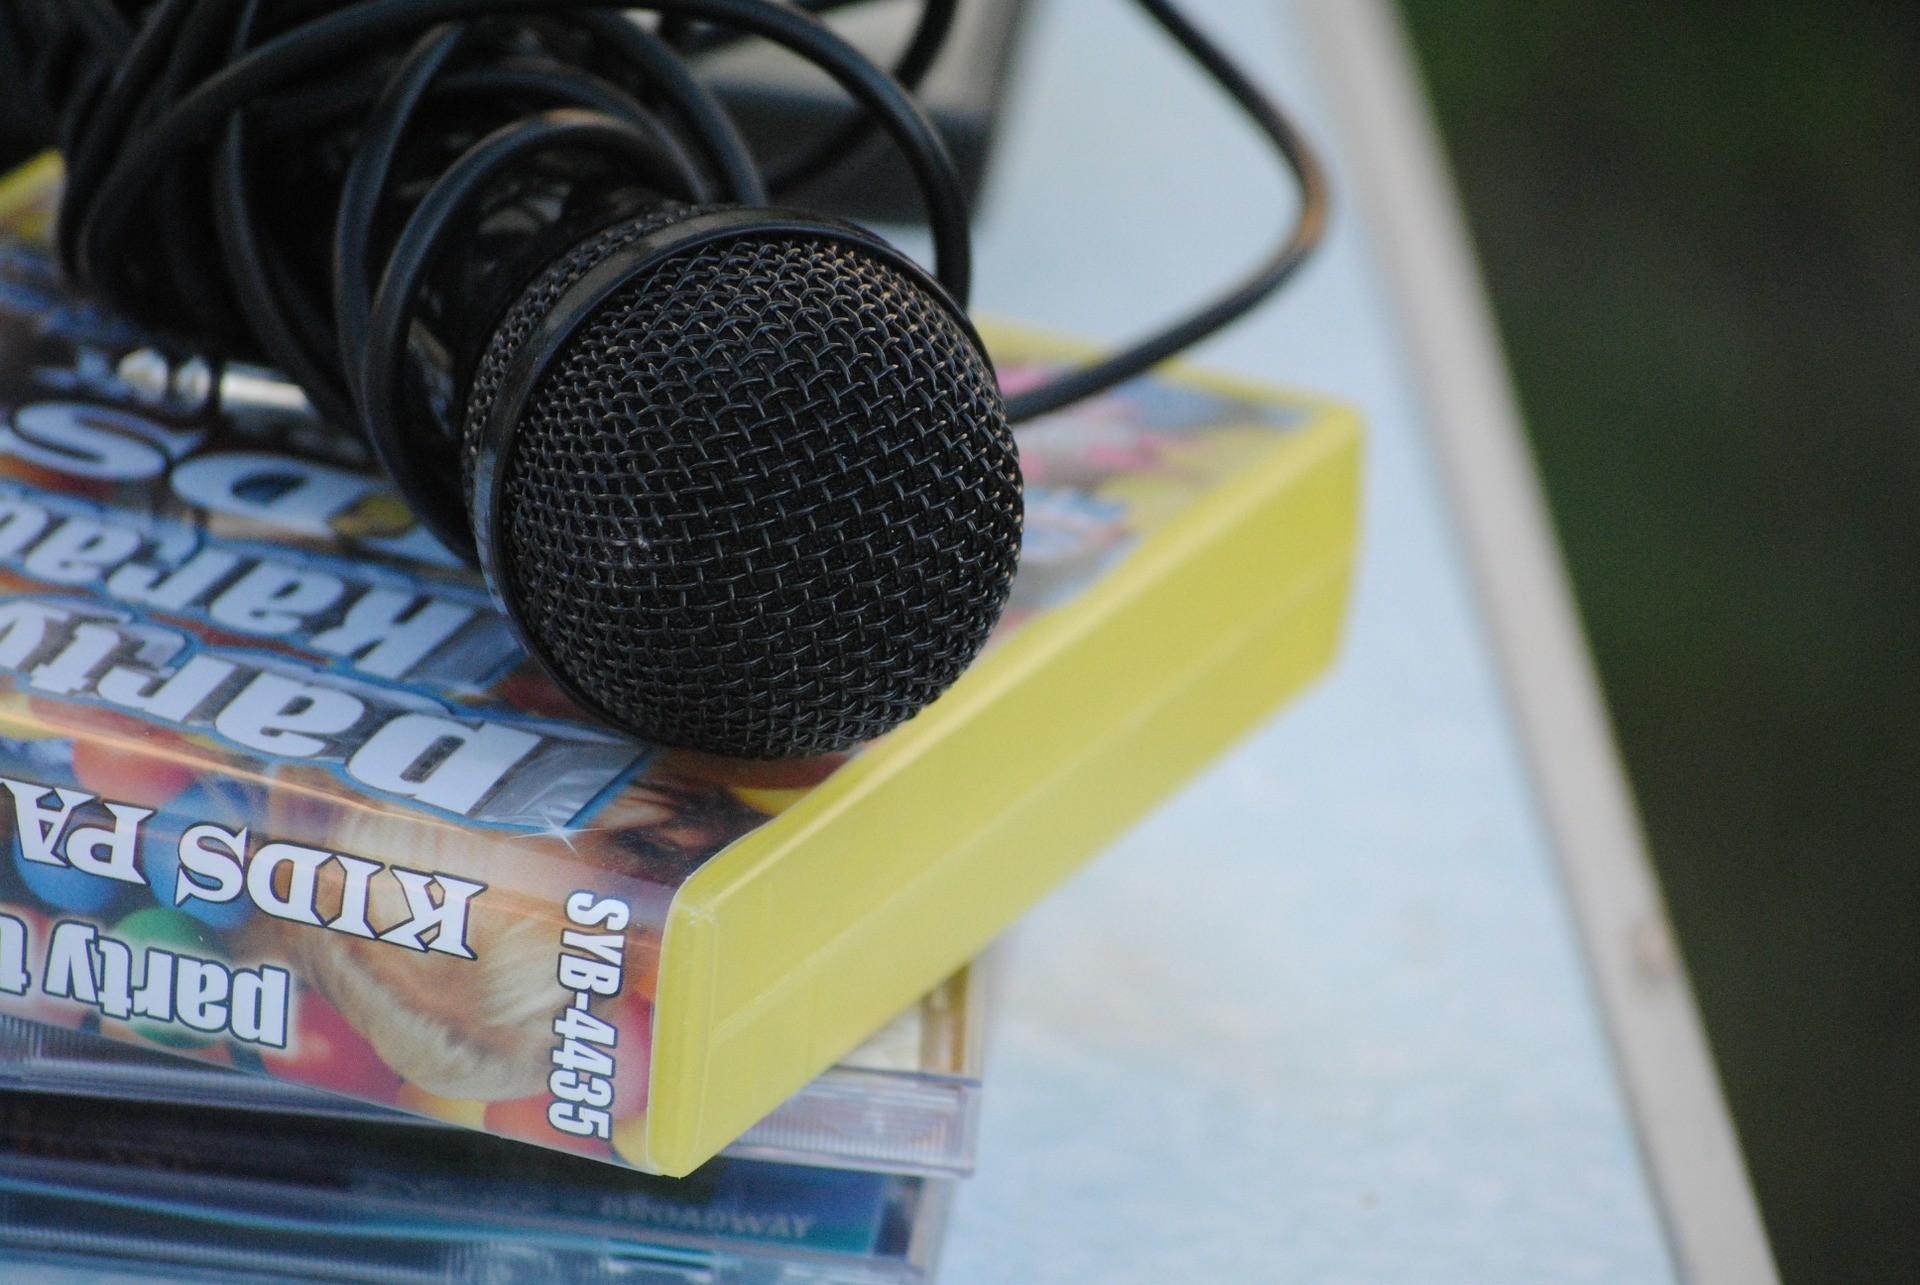 Best Karaoke Machines Reviewed And Rated In 2017 Videoke Machine Wiring Microphone Cds